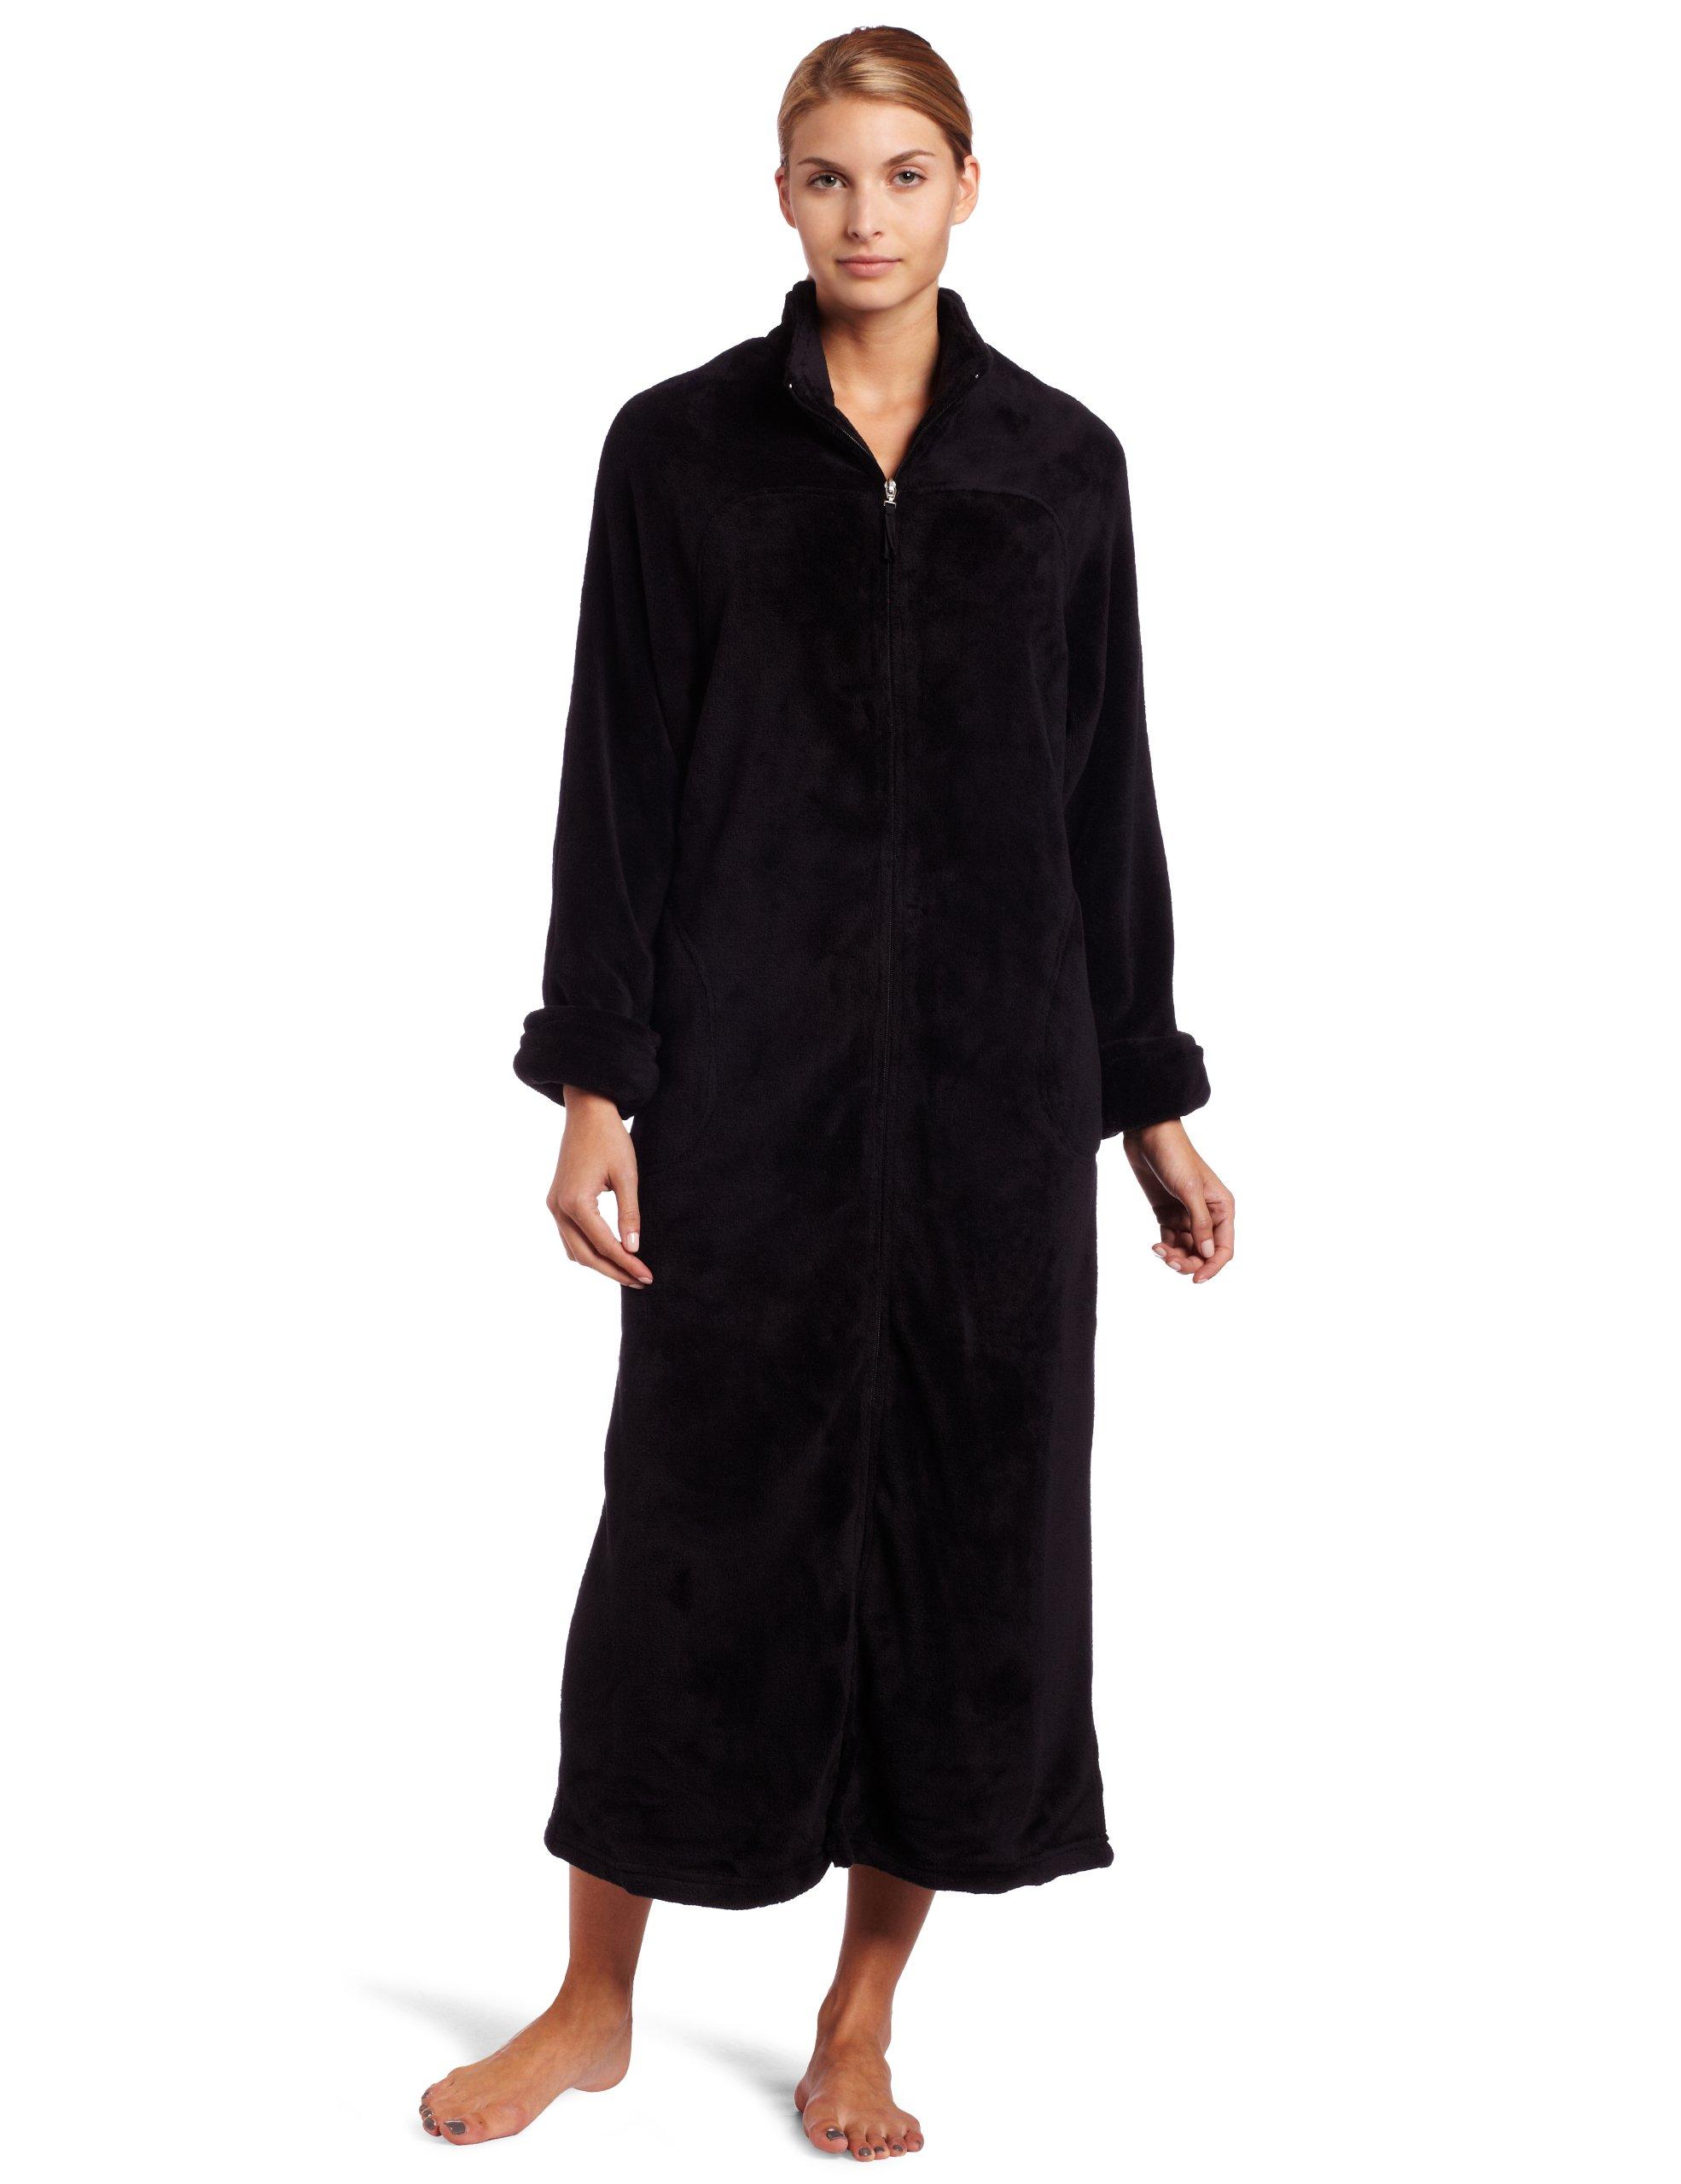 Casual Moments Womens 52 Inch Breakaway Zip Robe, Black, Large